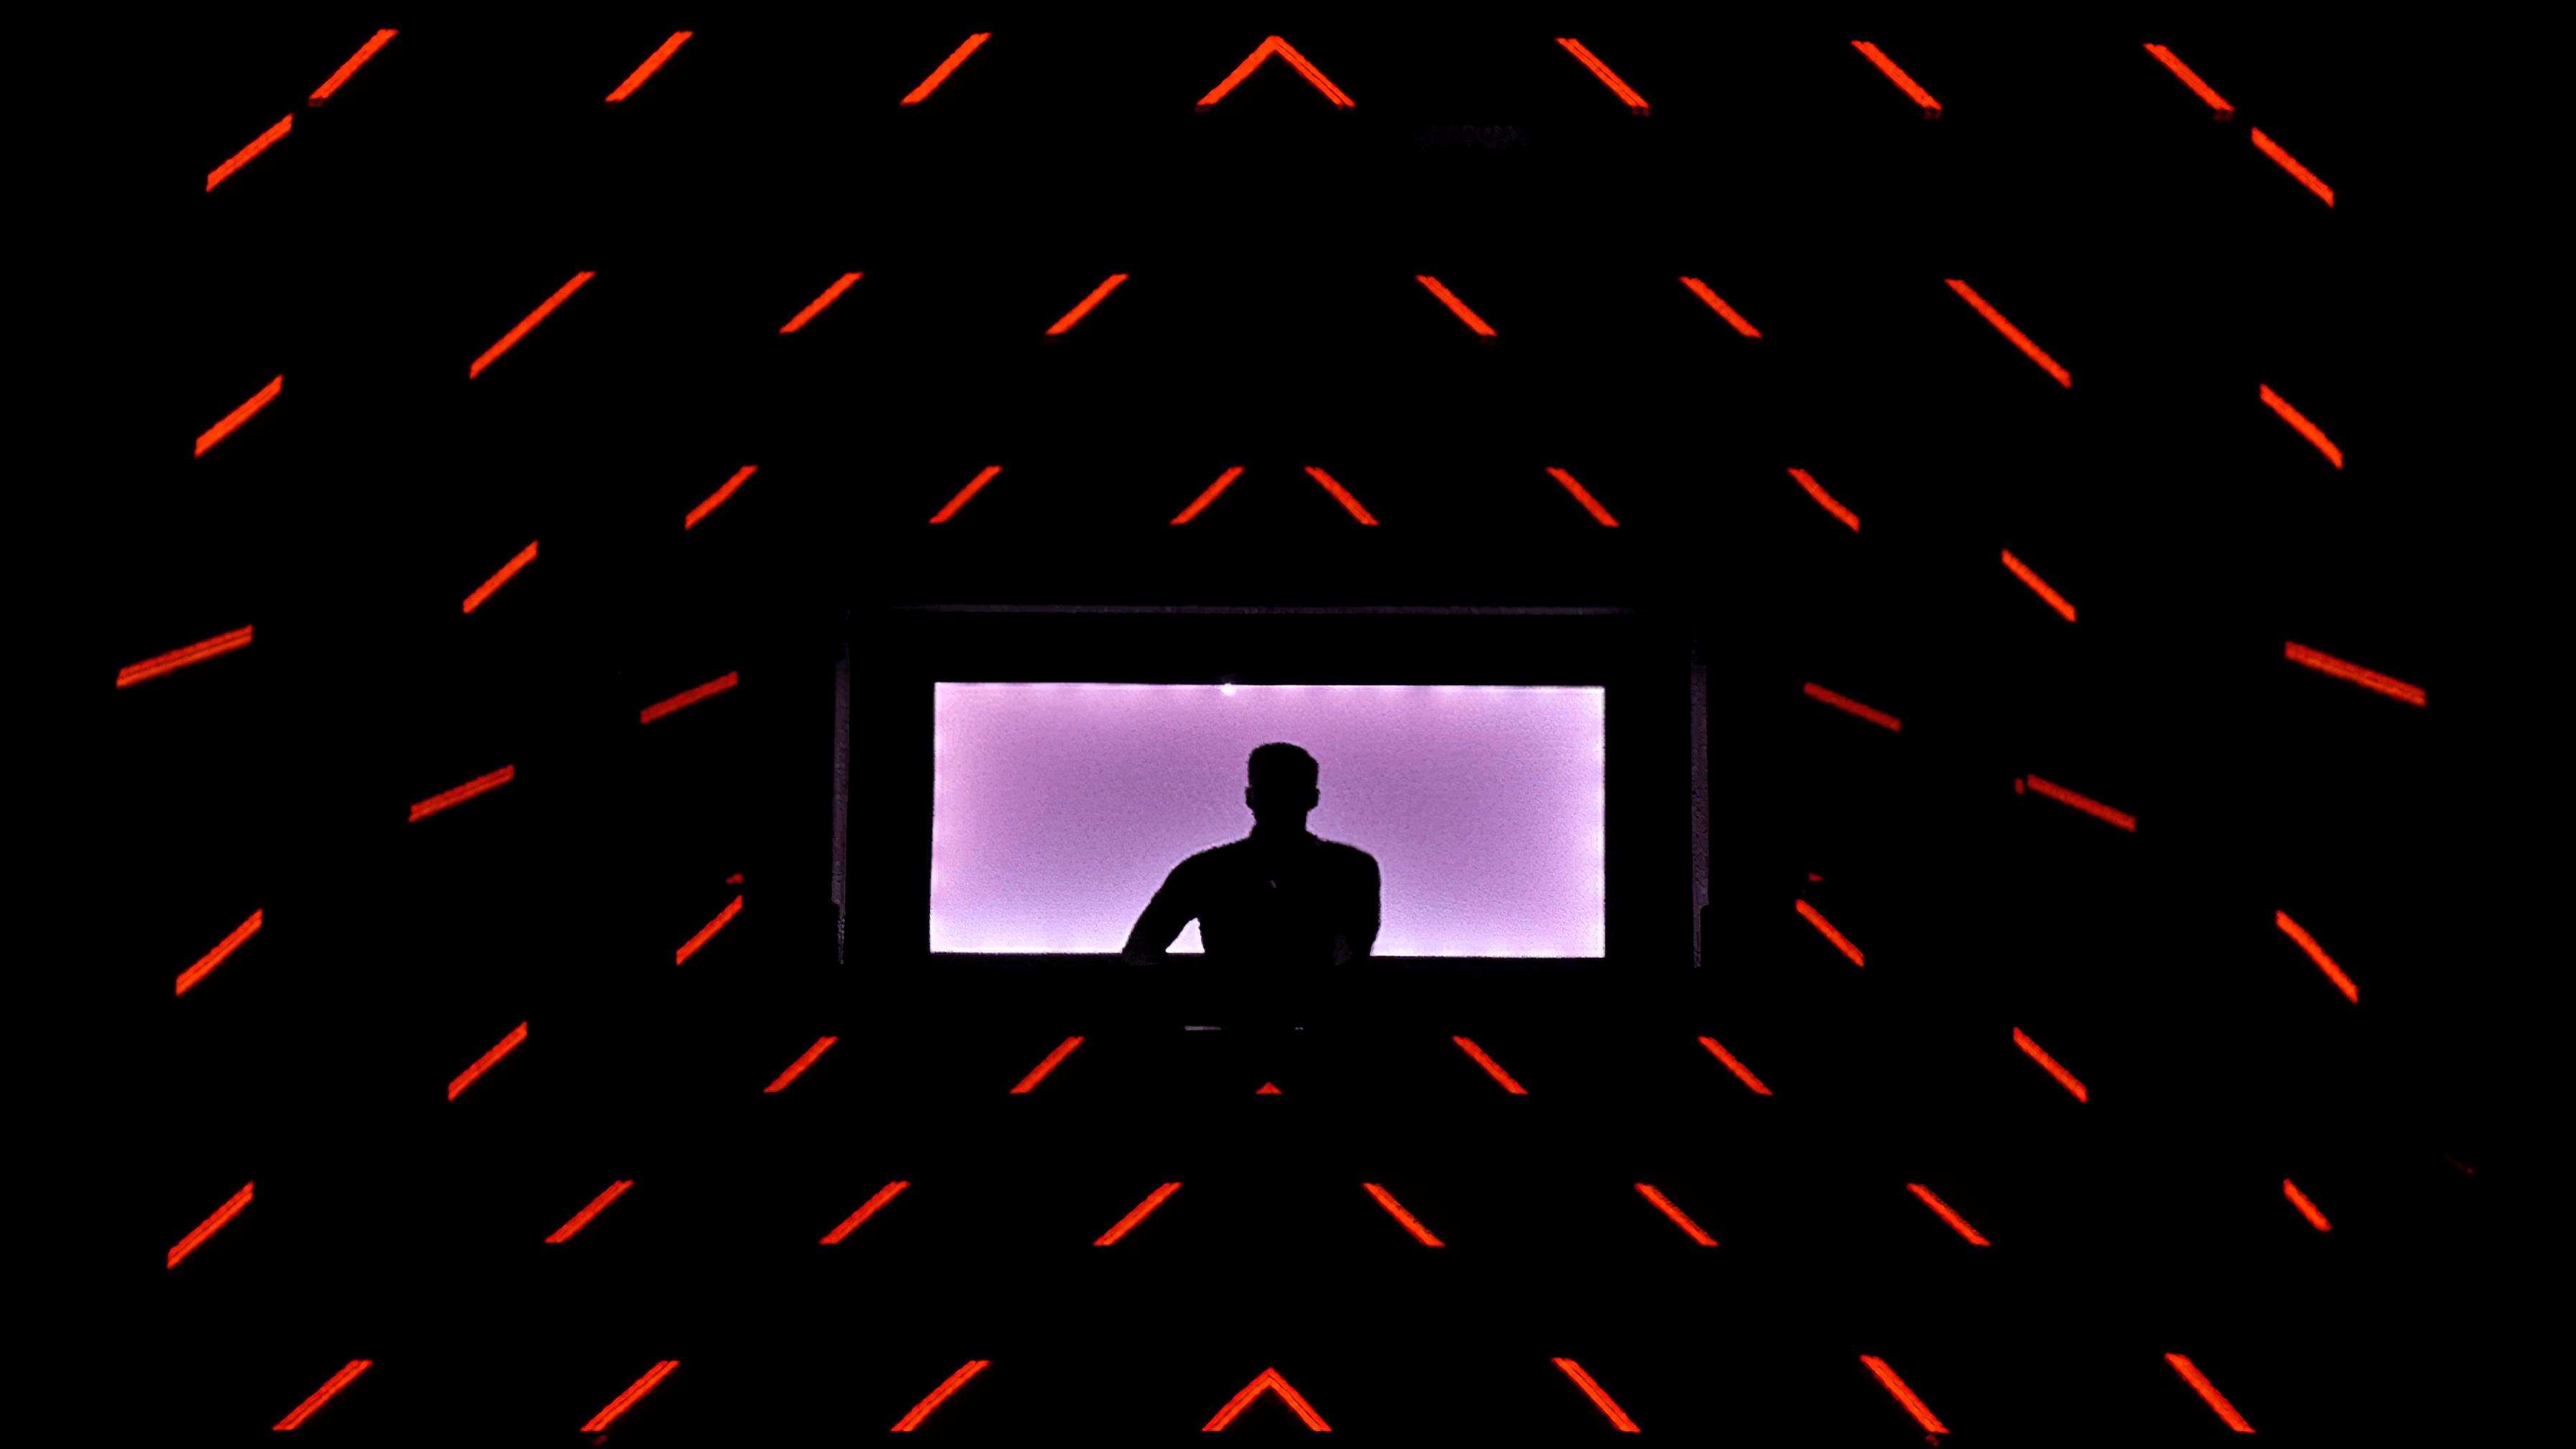 immersive-ltd_Maze_Adam-Beyer-Live-DJ_03-896×504-Gigapixel